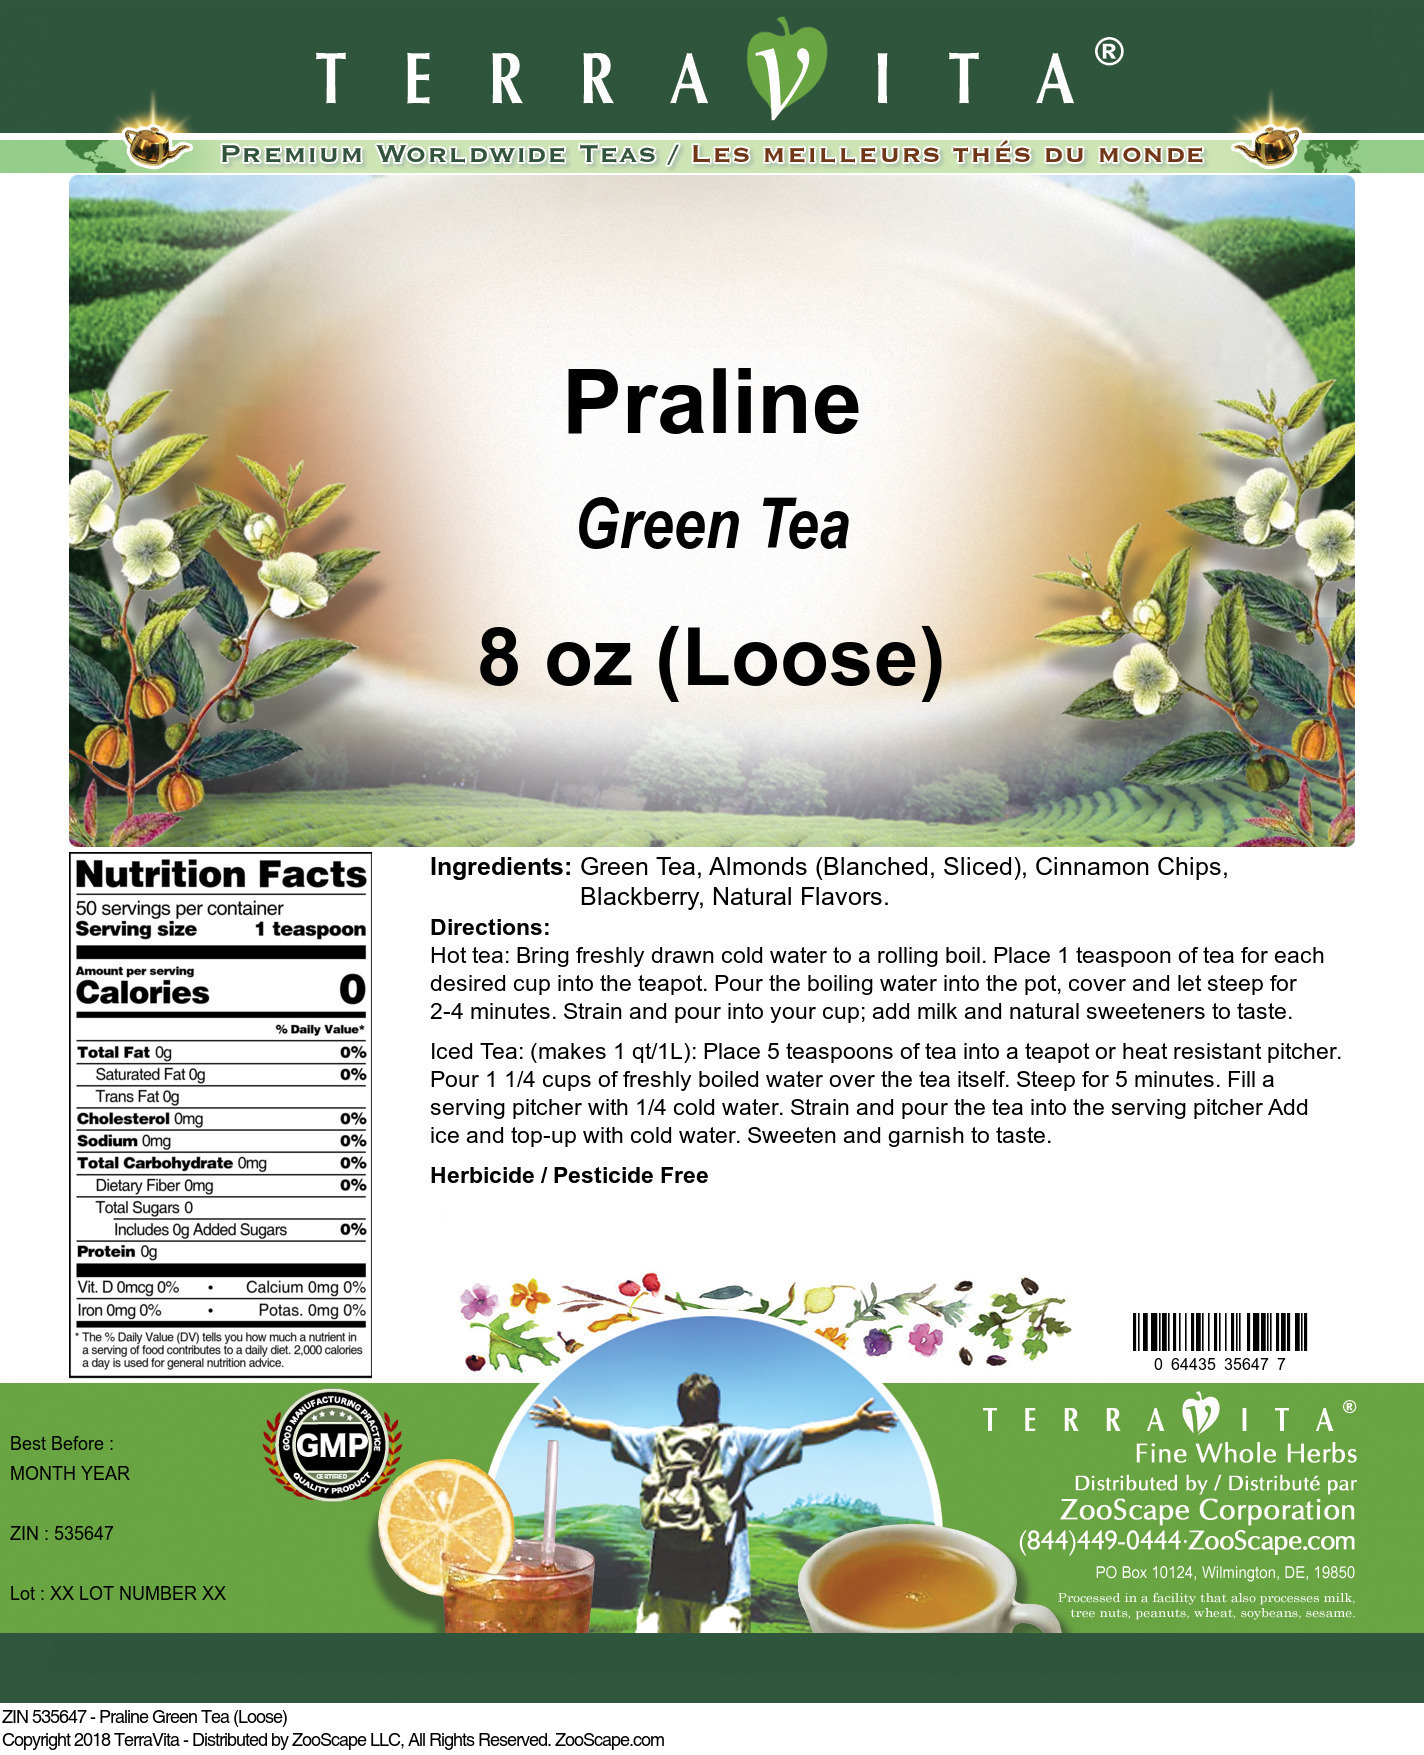 Praline Green Tea (Loose)